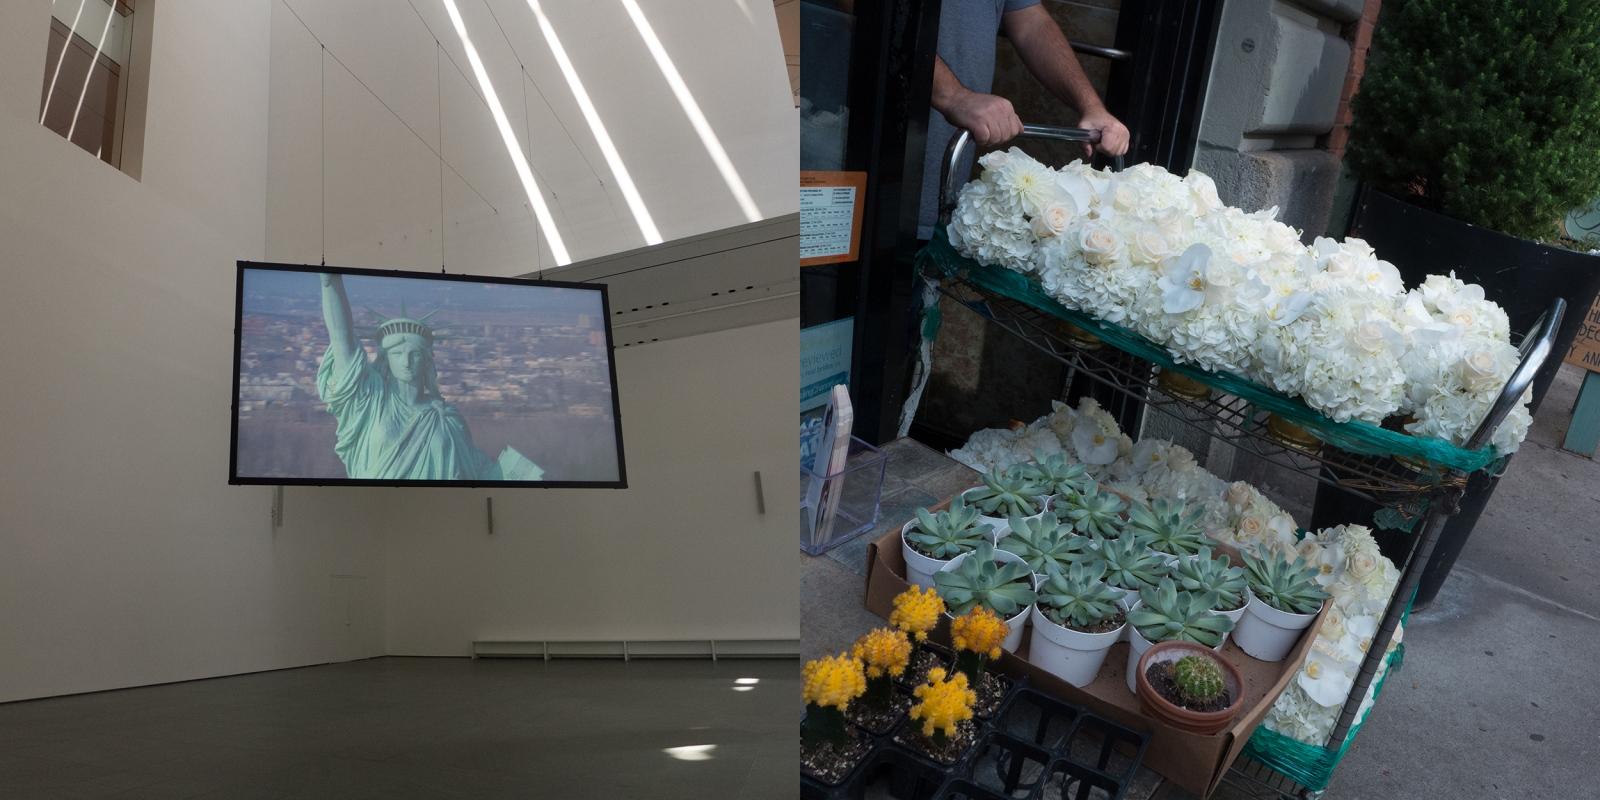 Art and Documentary Photography - Loading moma_statelib-flowers_for_website.jpg